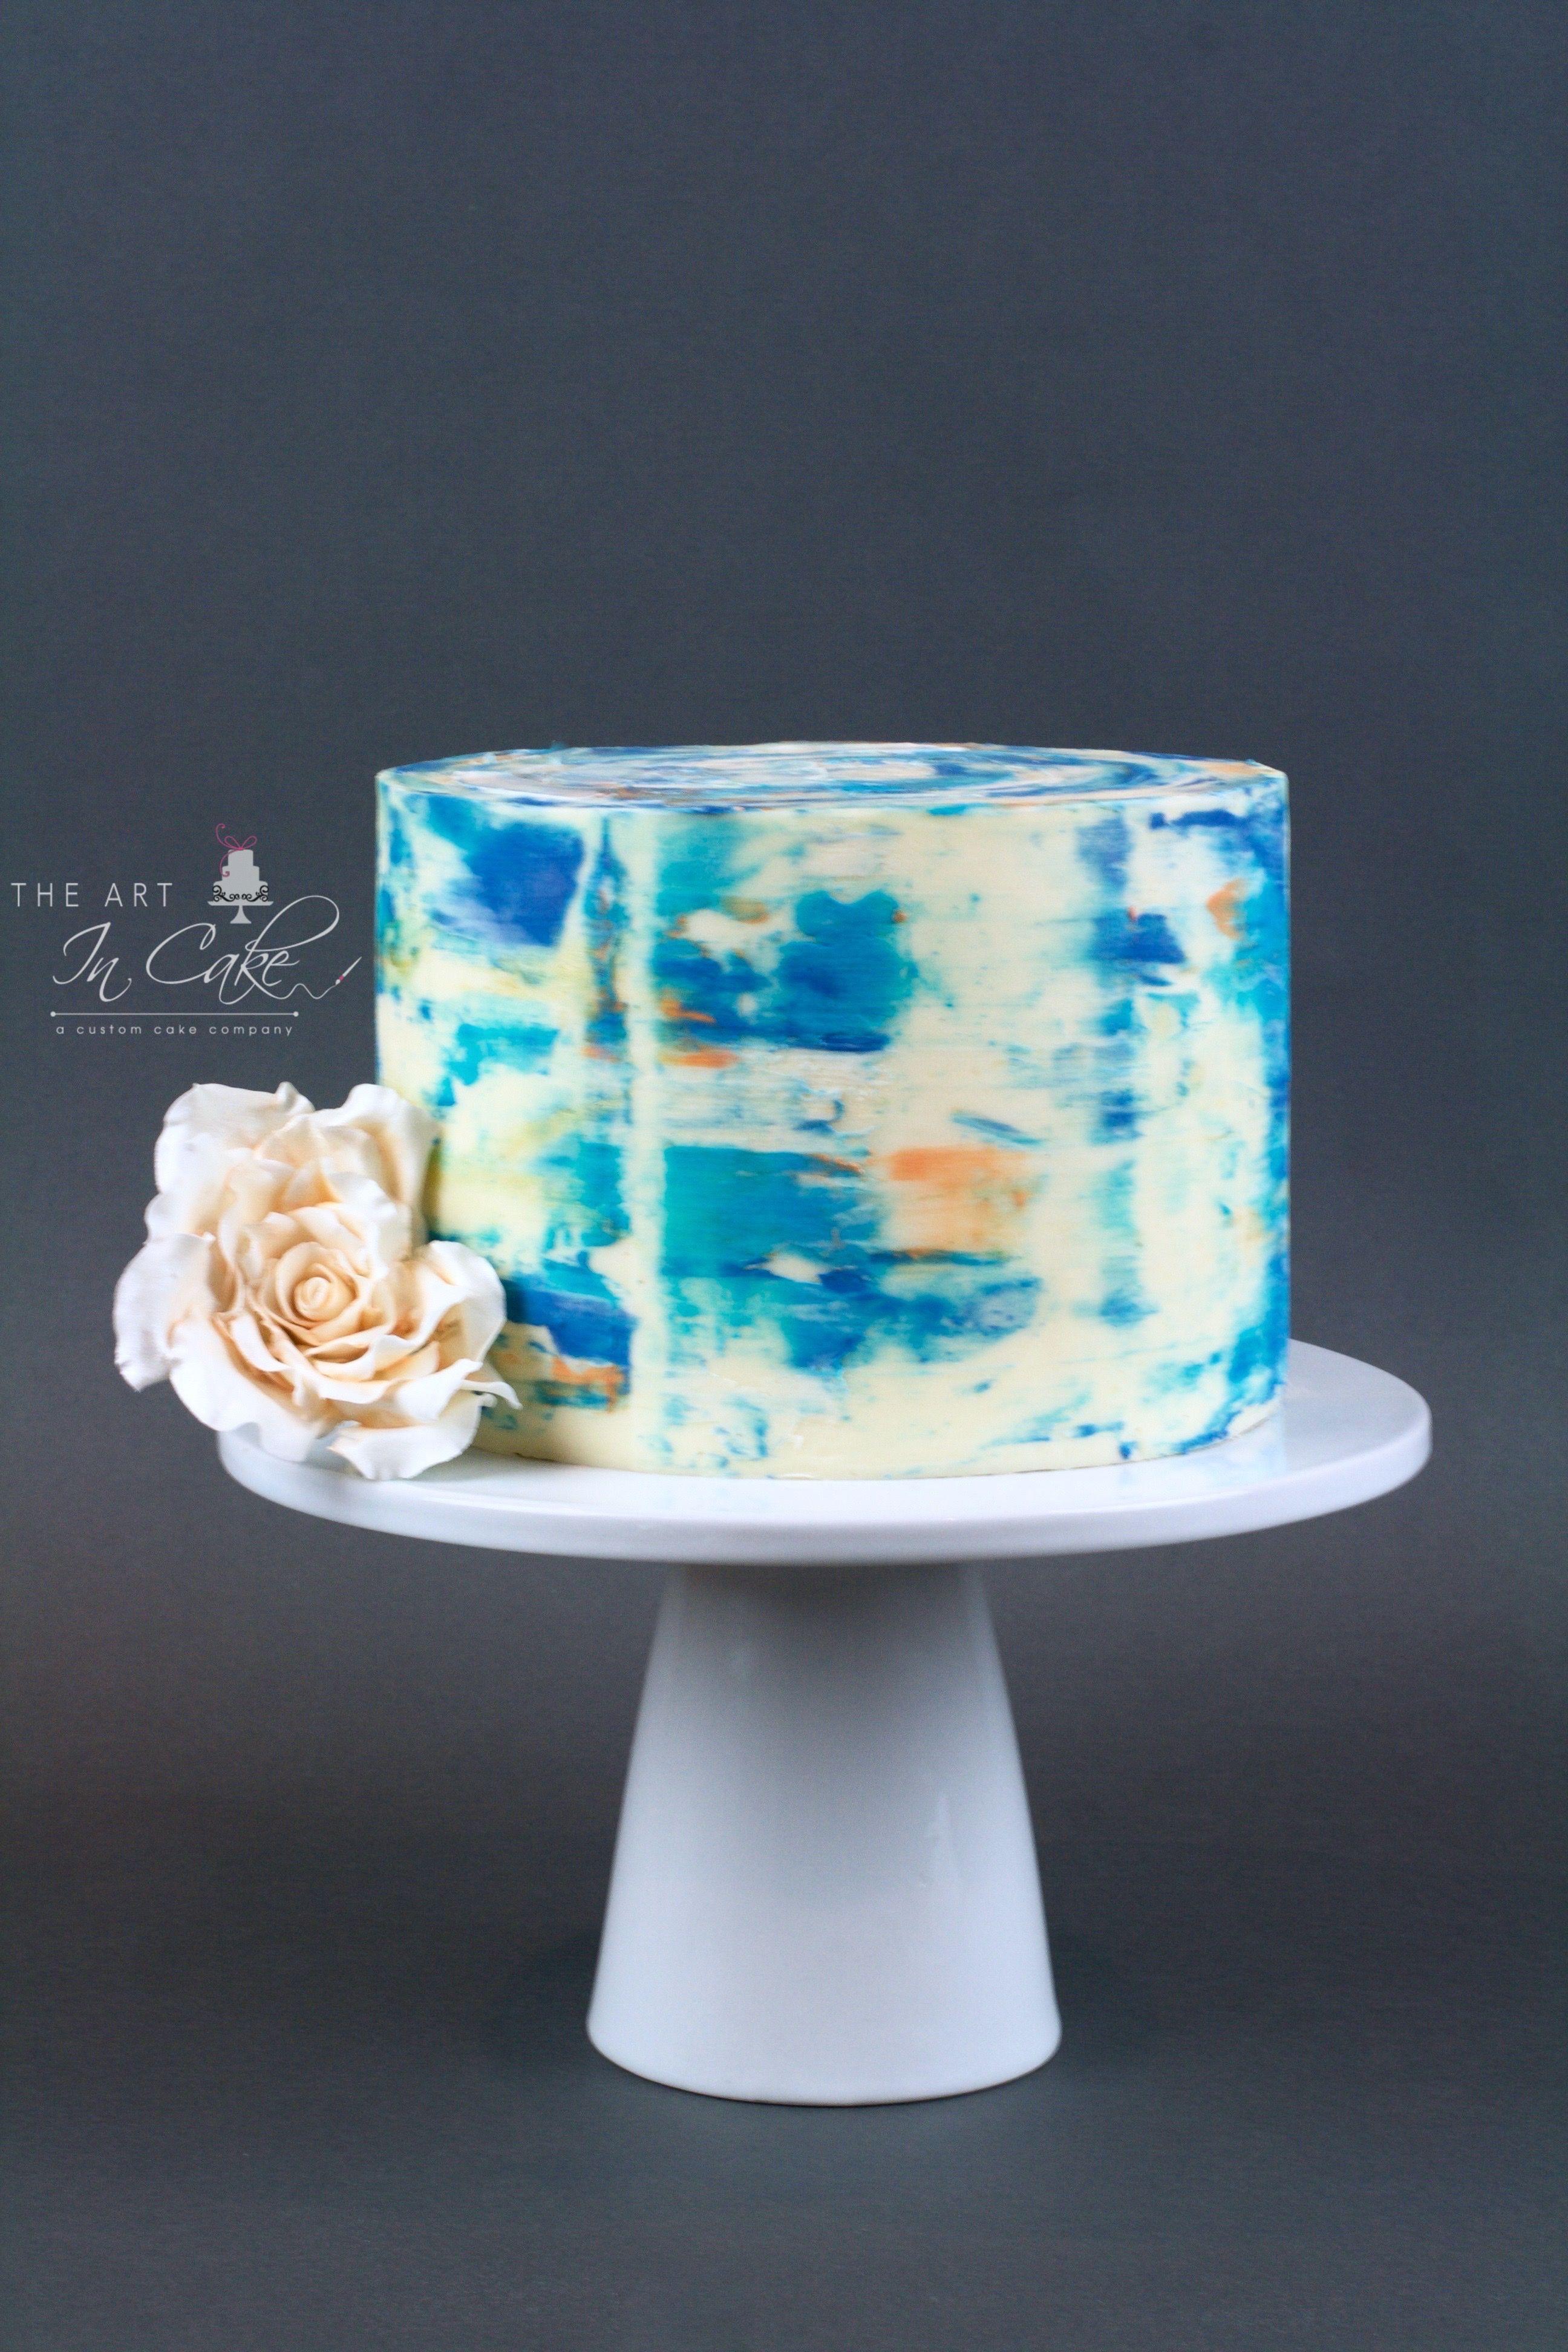 Custom Birthday Cakes St Louis Mo Best Wedding Cake 2018